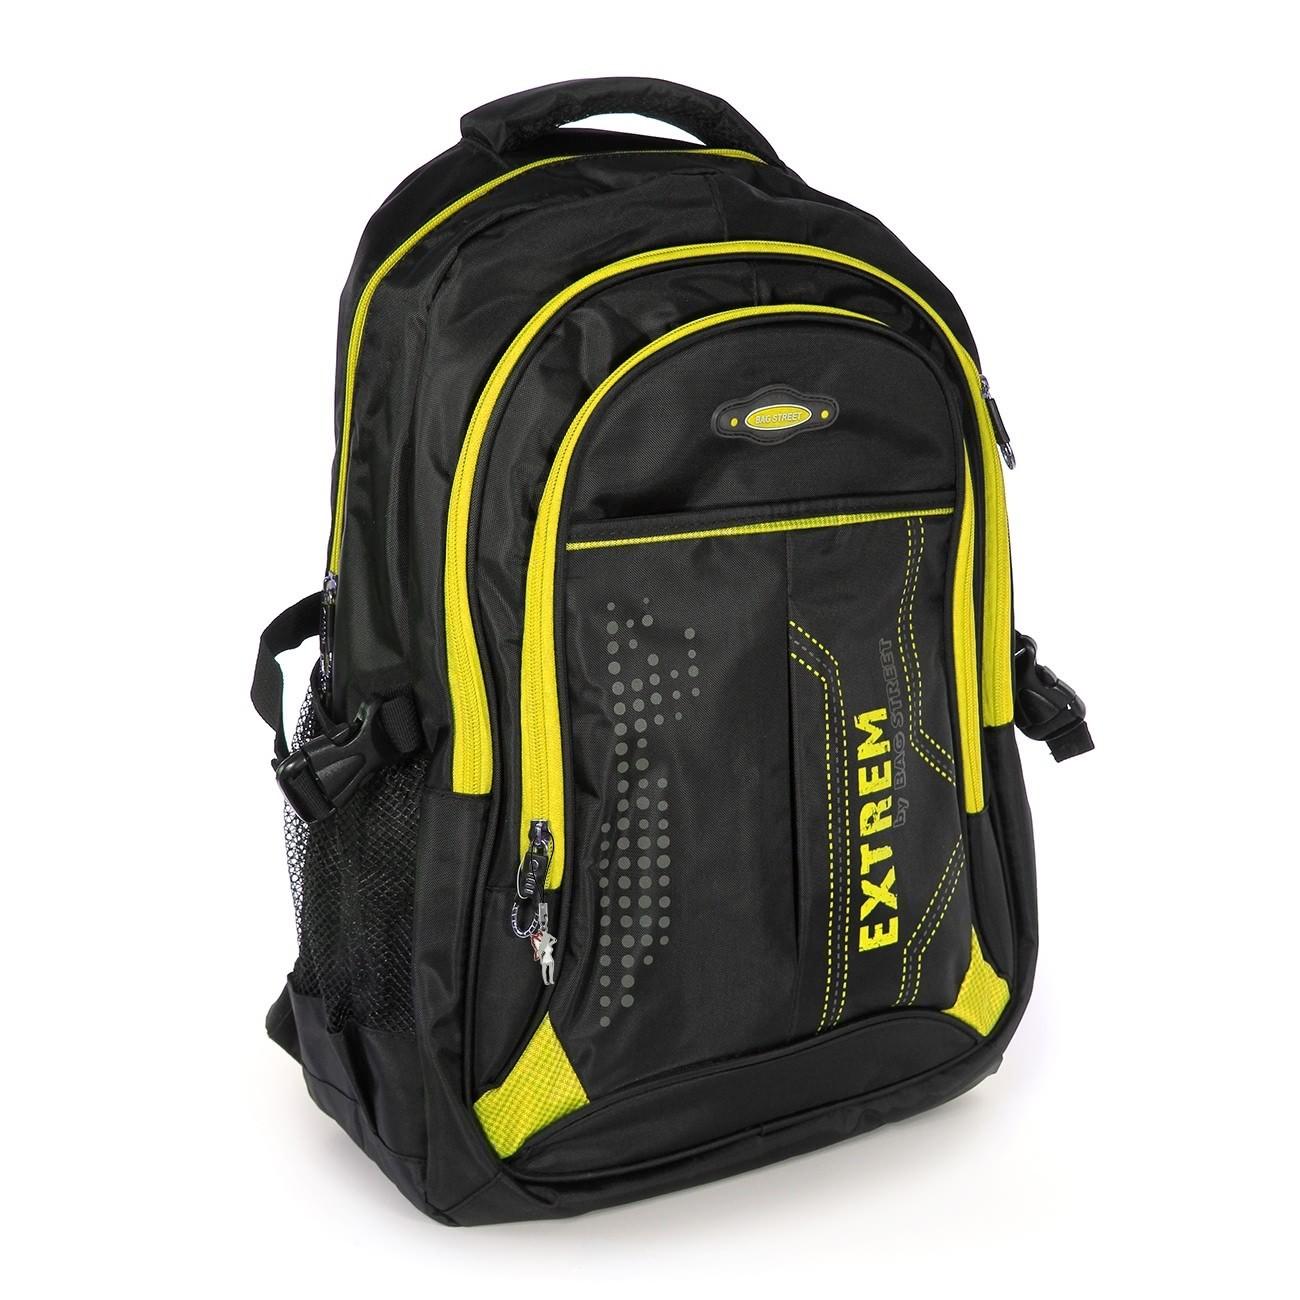 Rucksack Synthetik schwarz, gelb Laptopfach Laptoprucksack Bag Street OTJ605Y